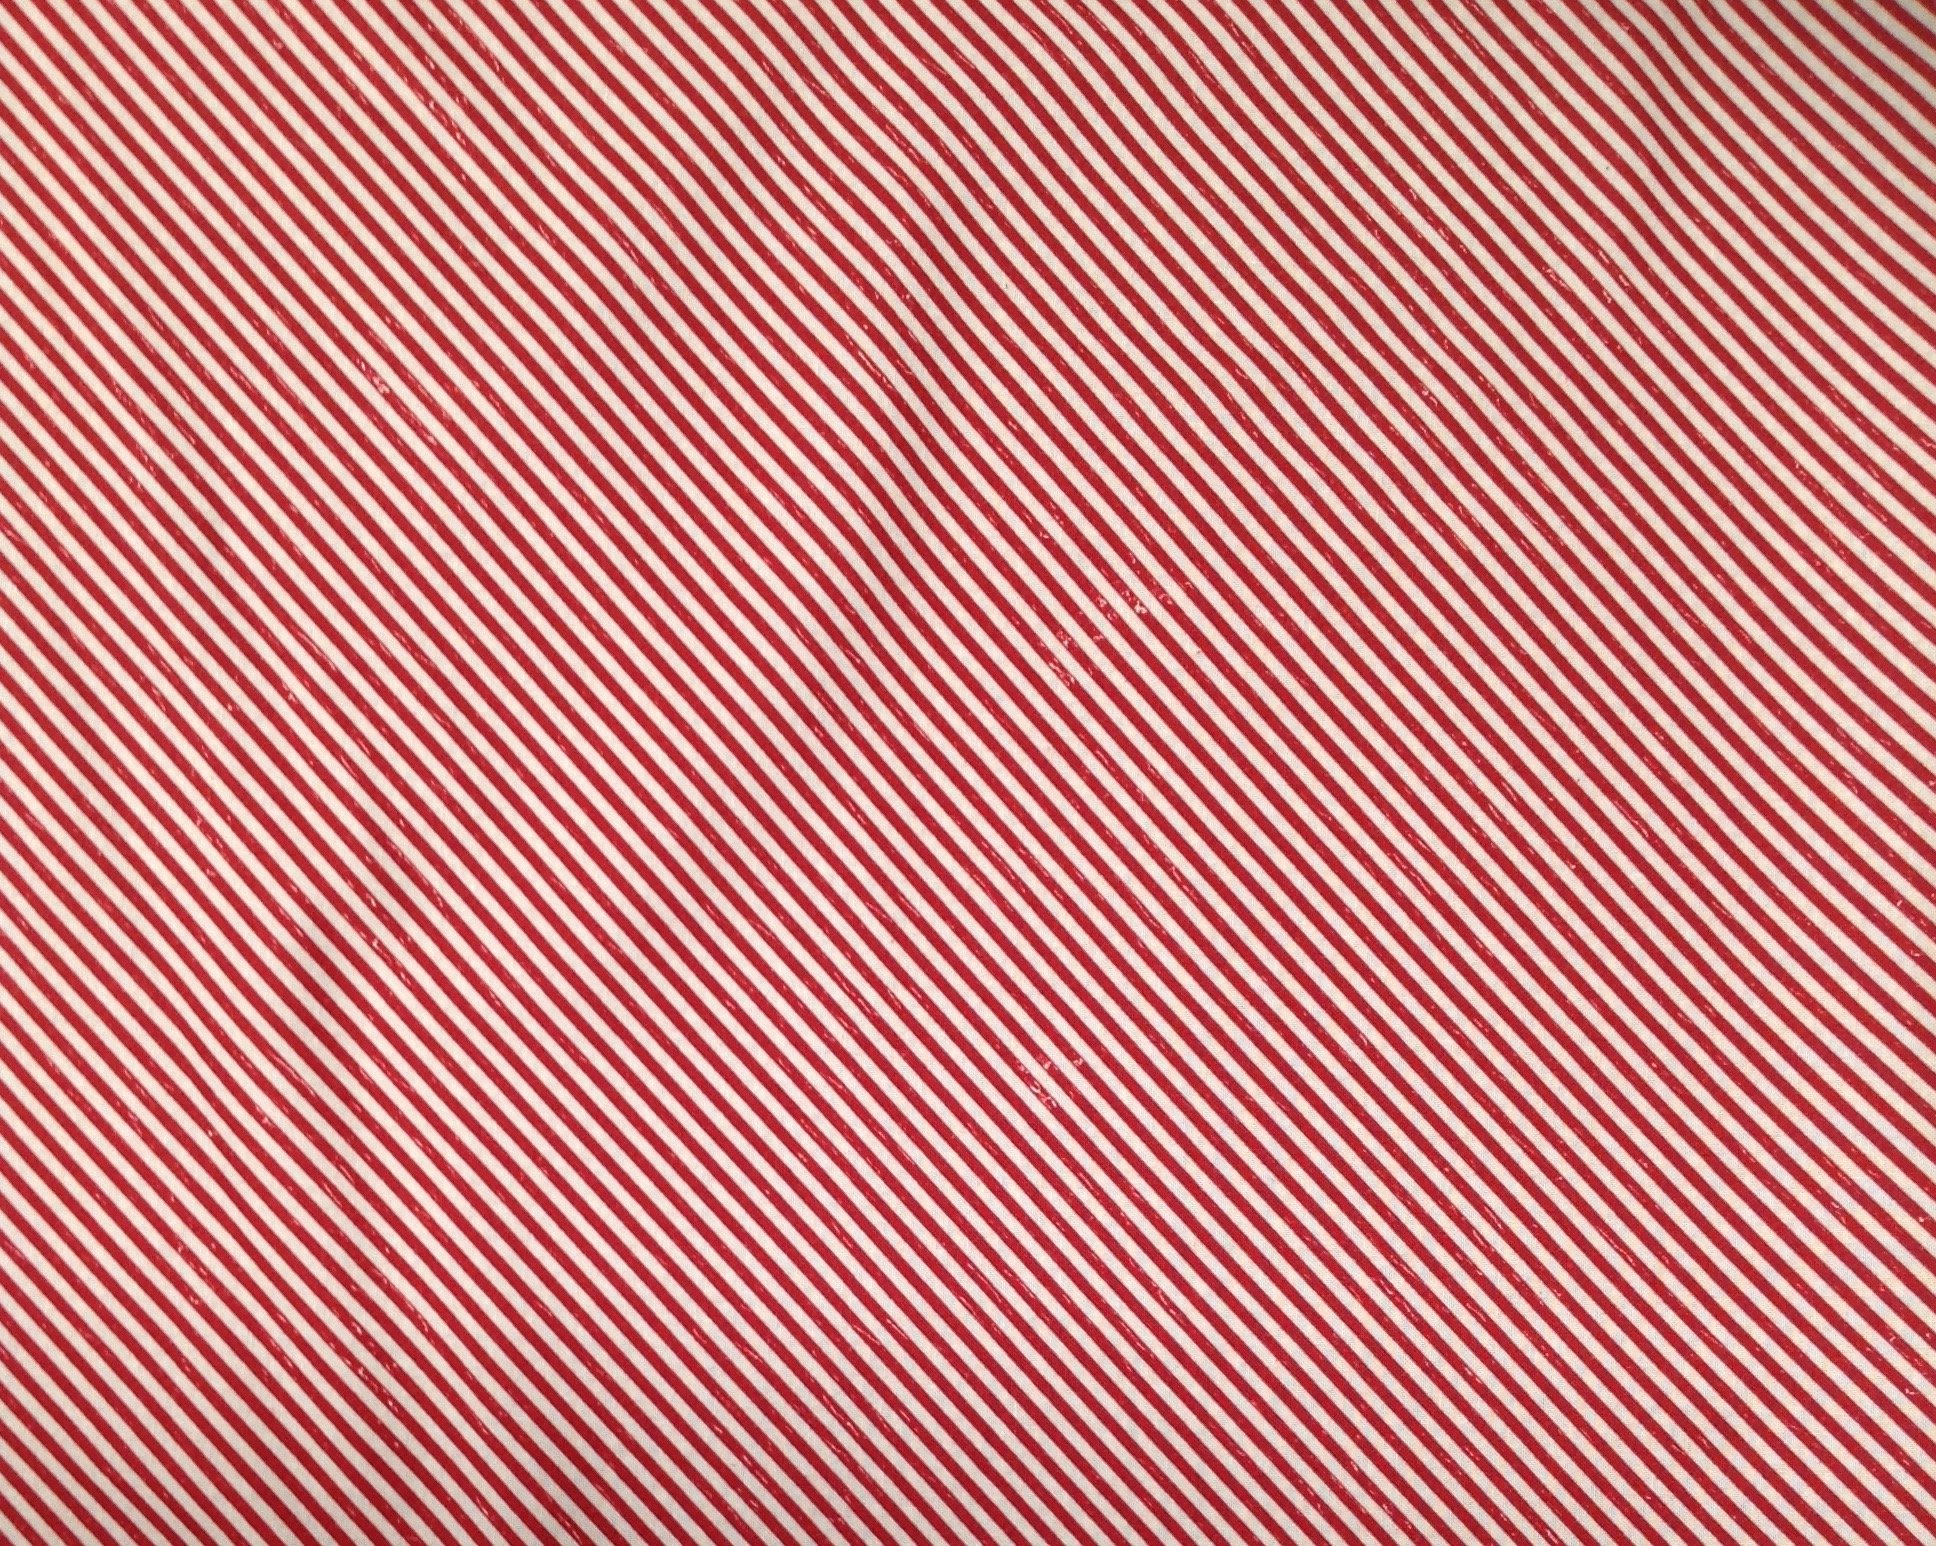 American Valor - Red/White Stripe